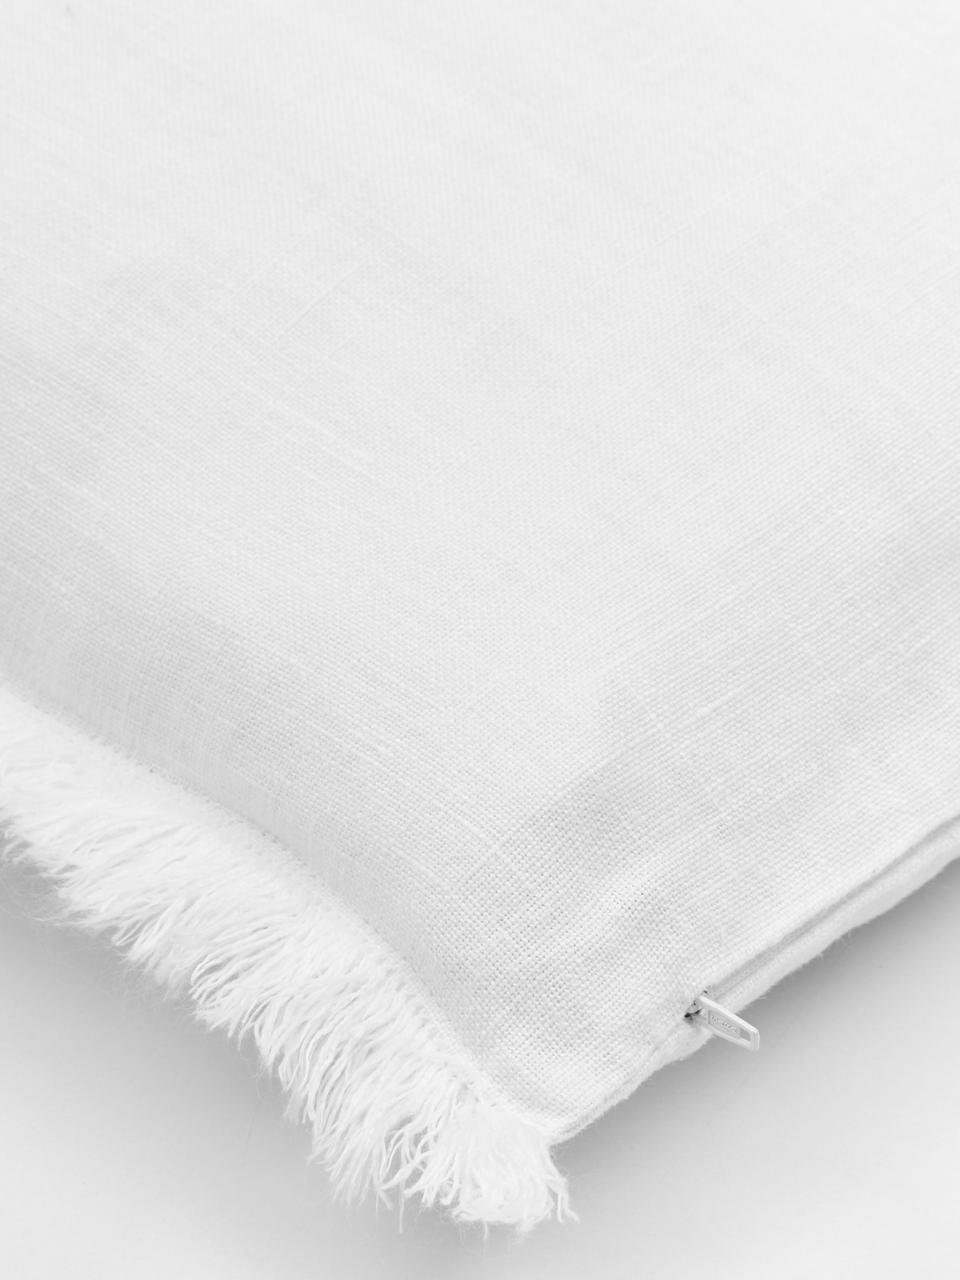 Linnen kussenhoes Luana in crèmewit met franjes, 100% linnen, Crèmewit, 60 x 60 cm